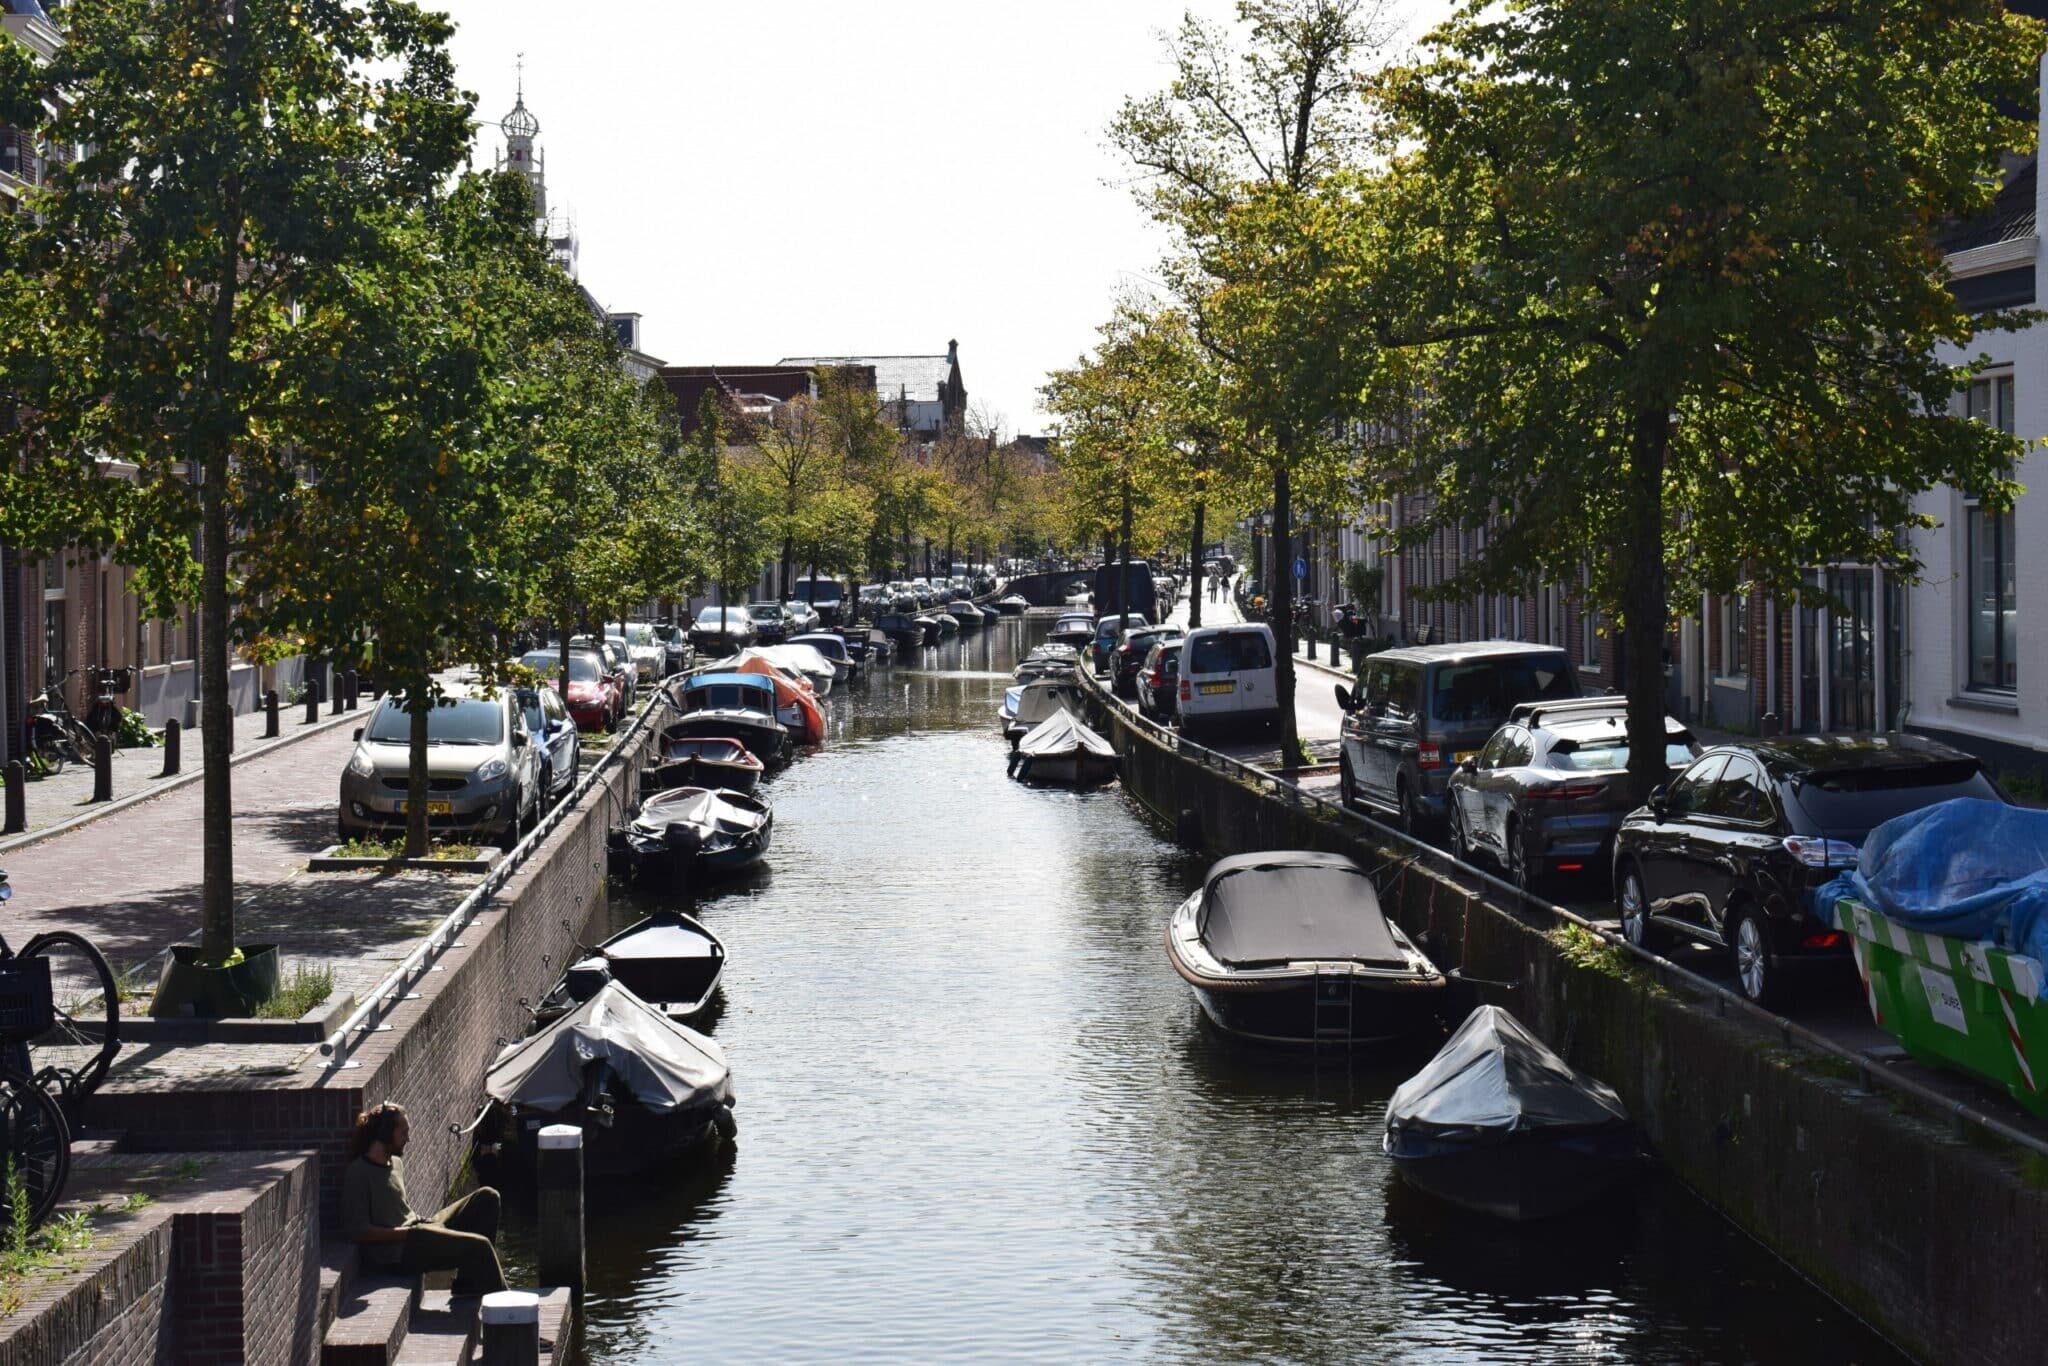 Road trip to North Holland: Sint Maartenszee, Alkmaar & Haarlem